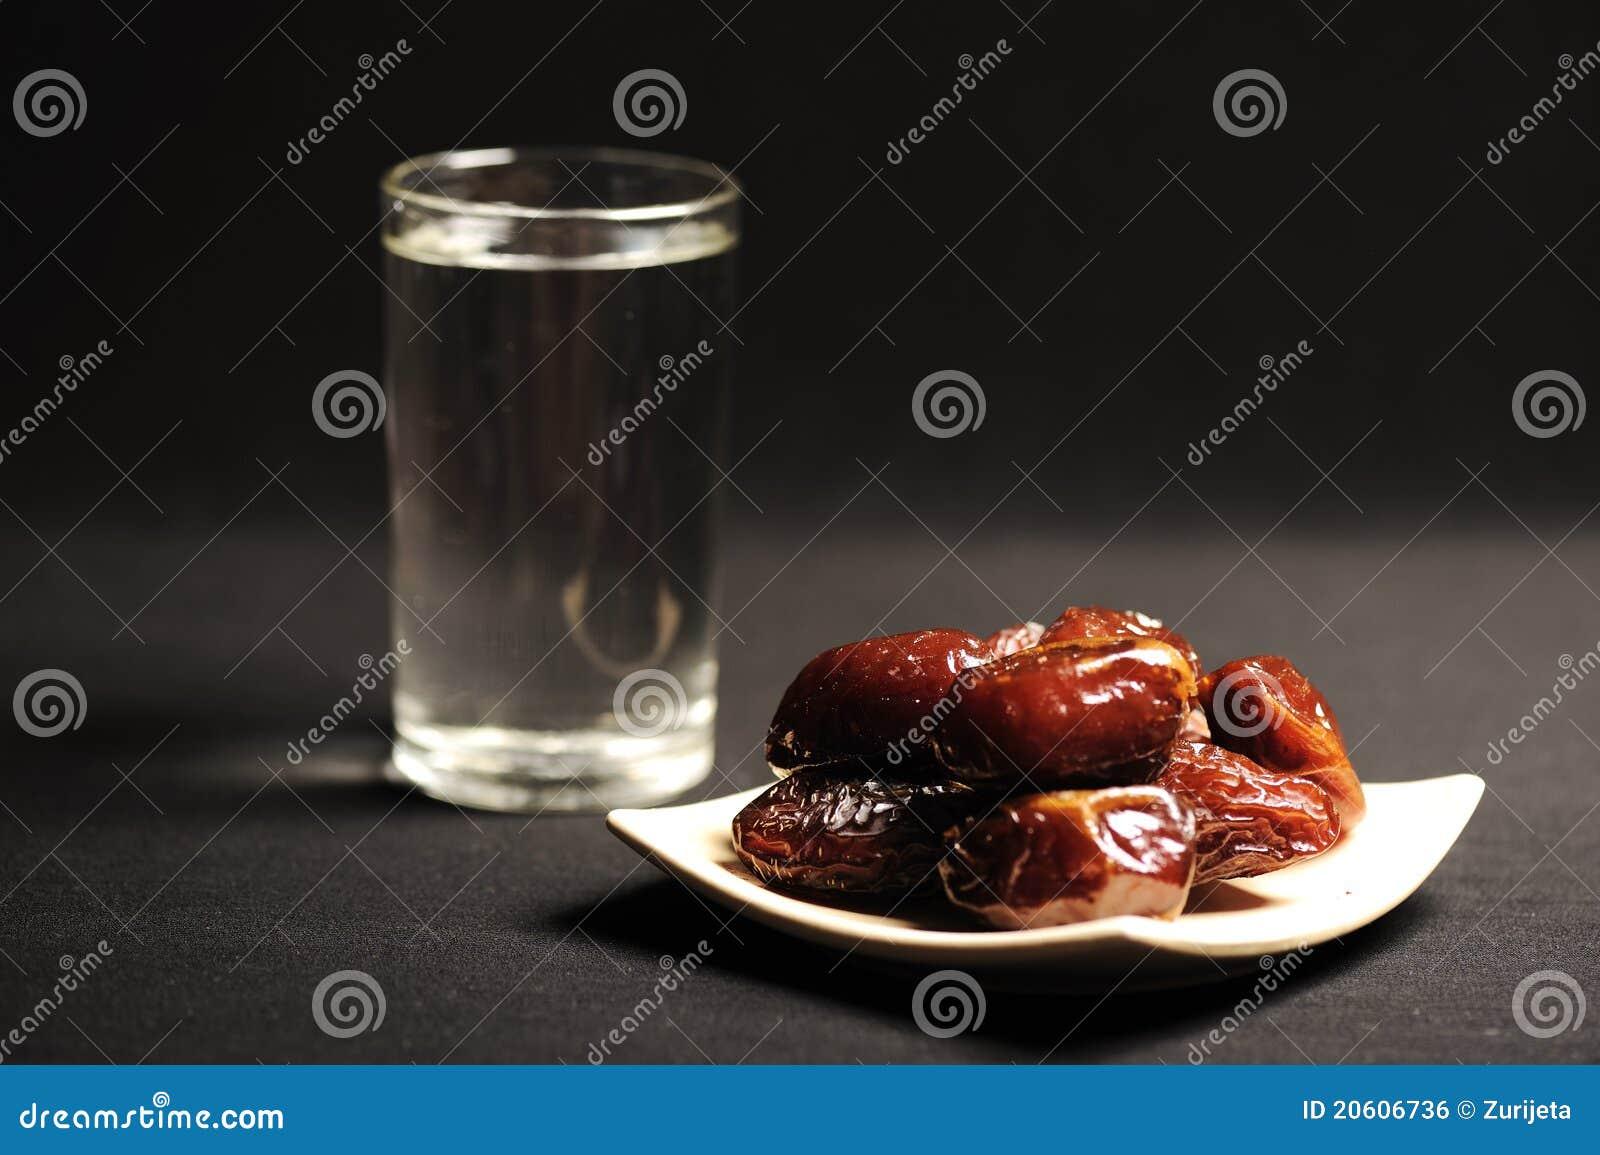 Ramadan is comming: water